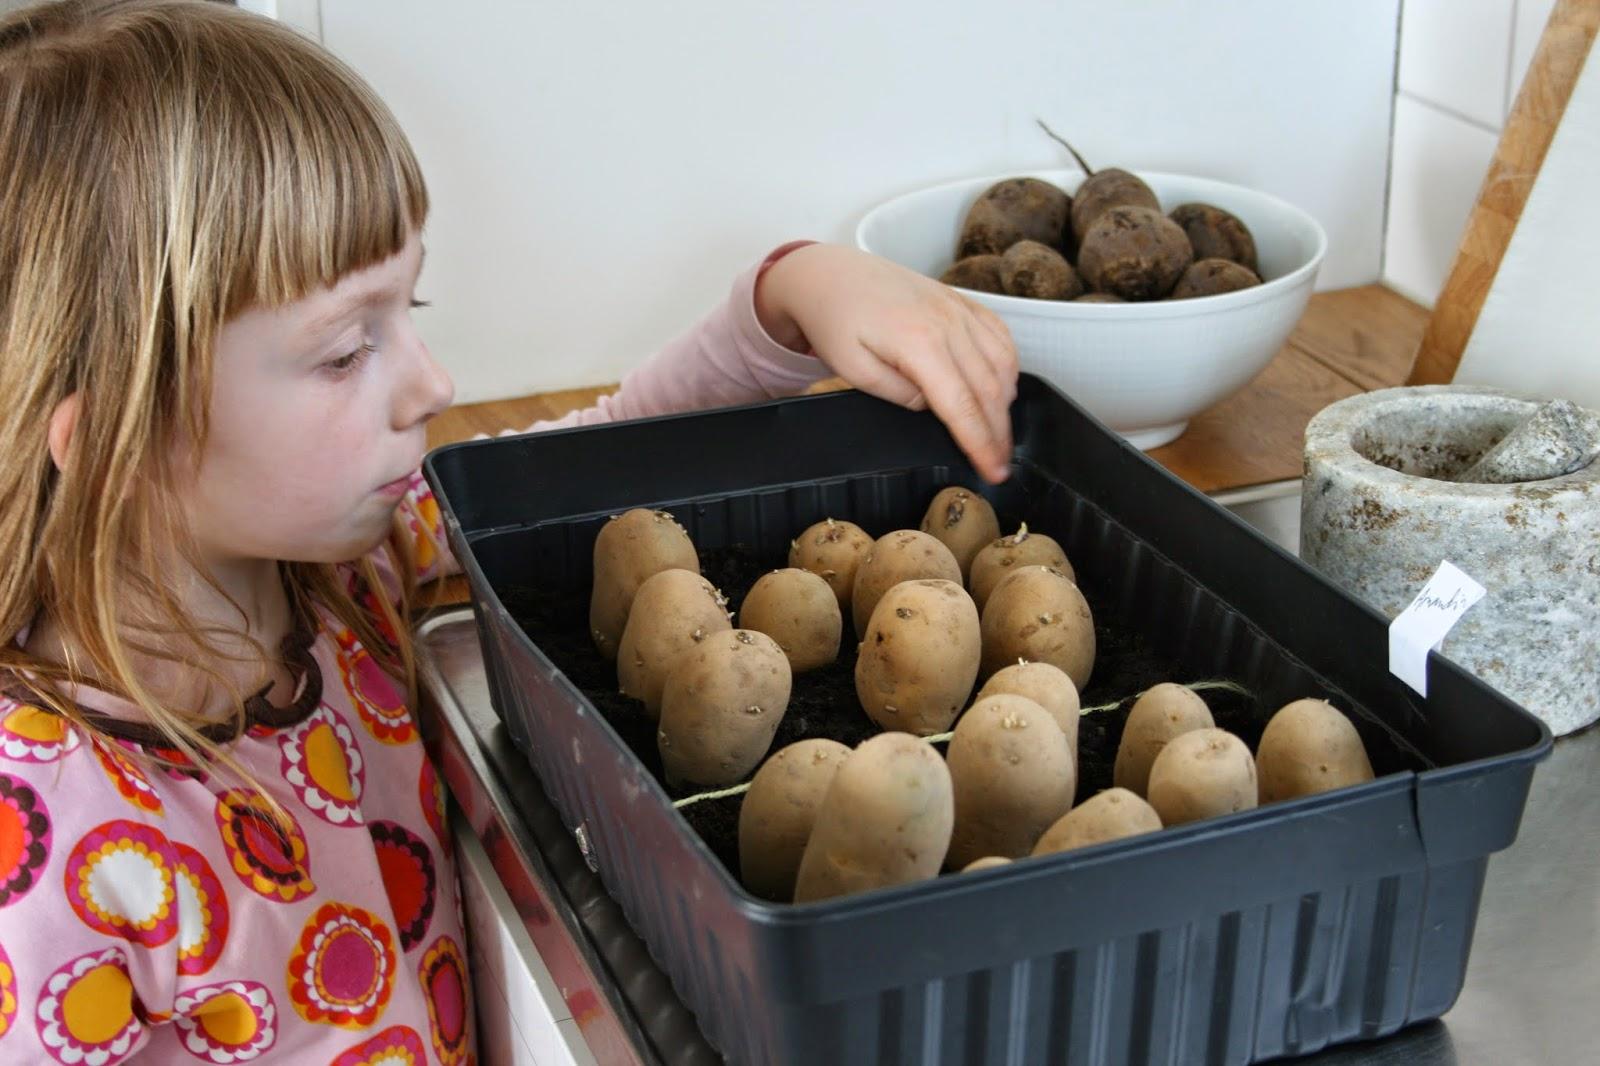 odla potatis